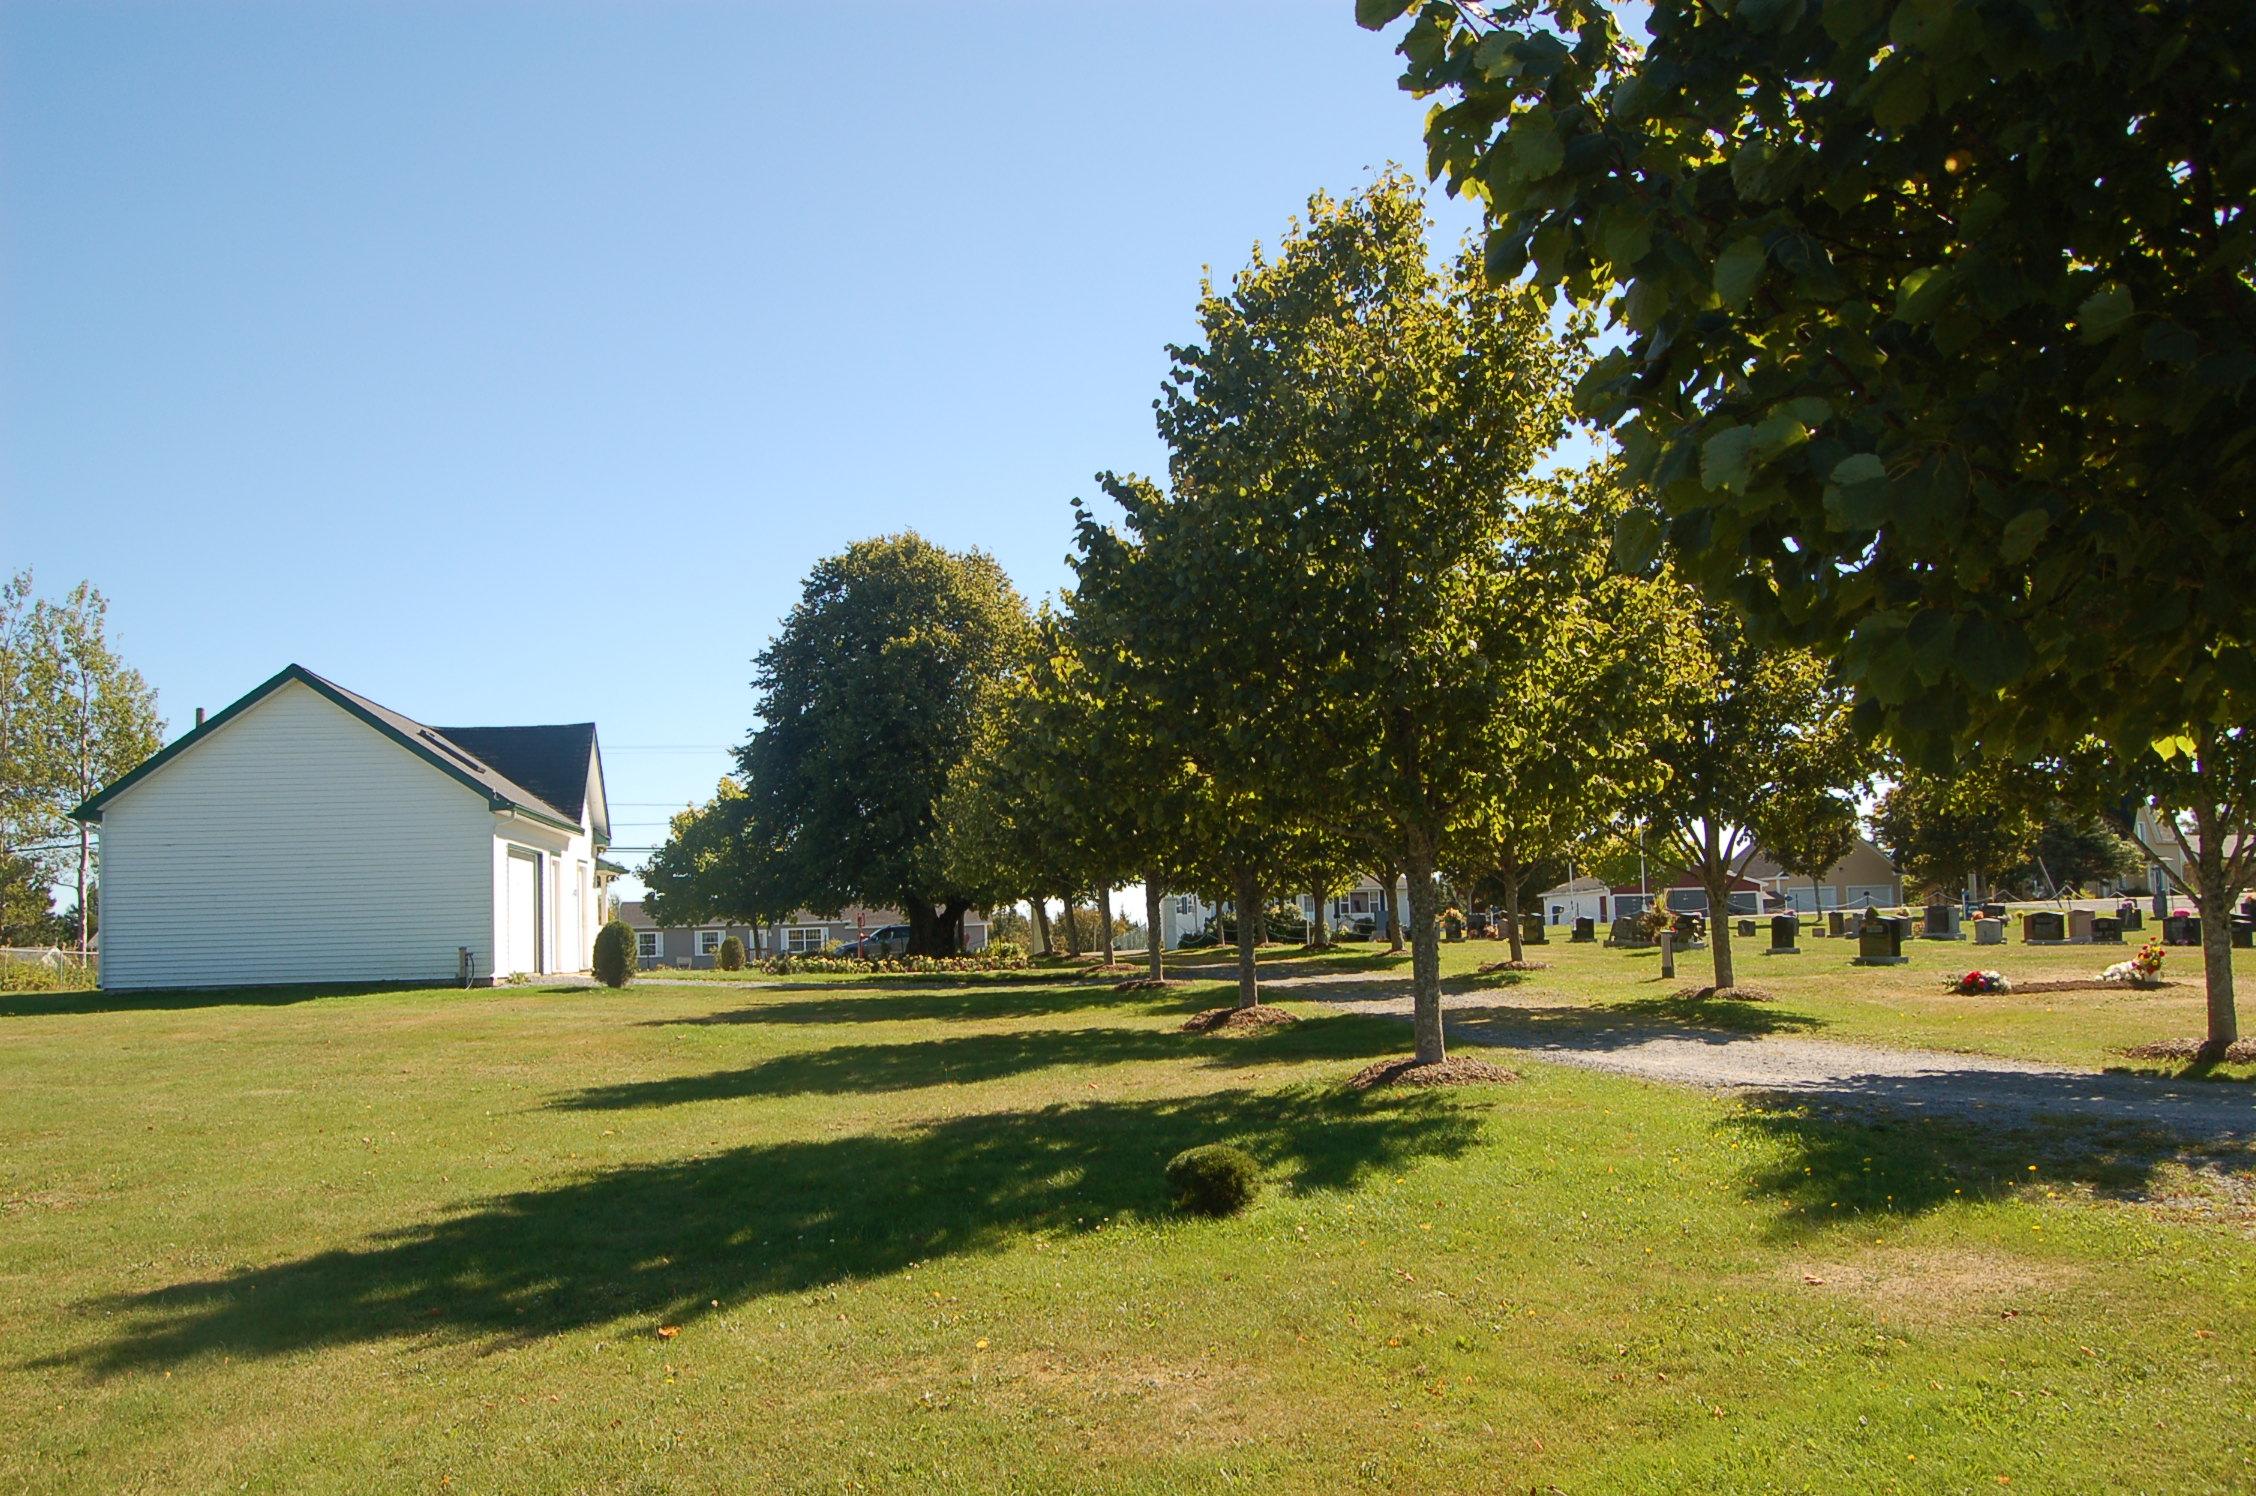 Visitor's Centre 12a